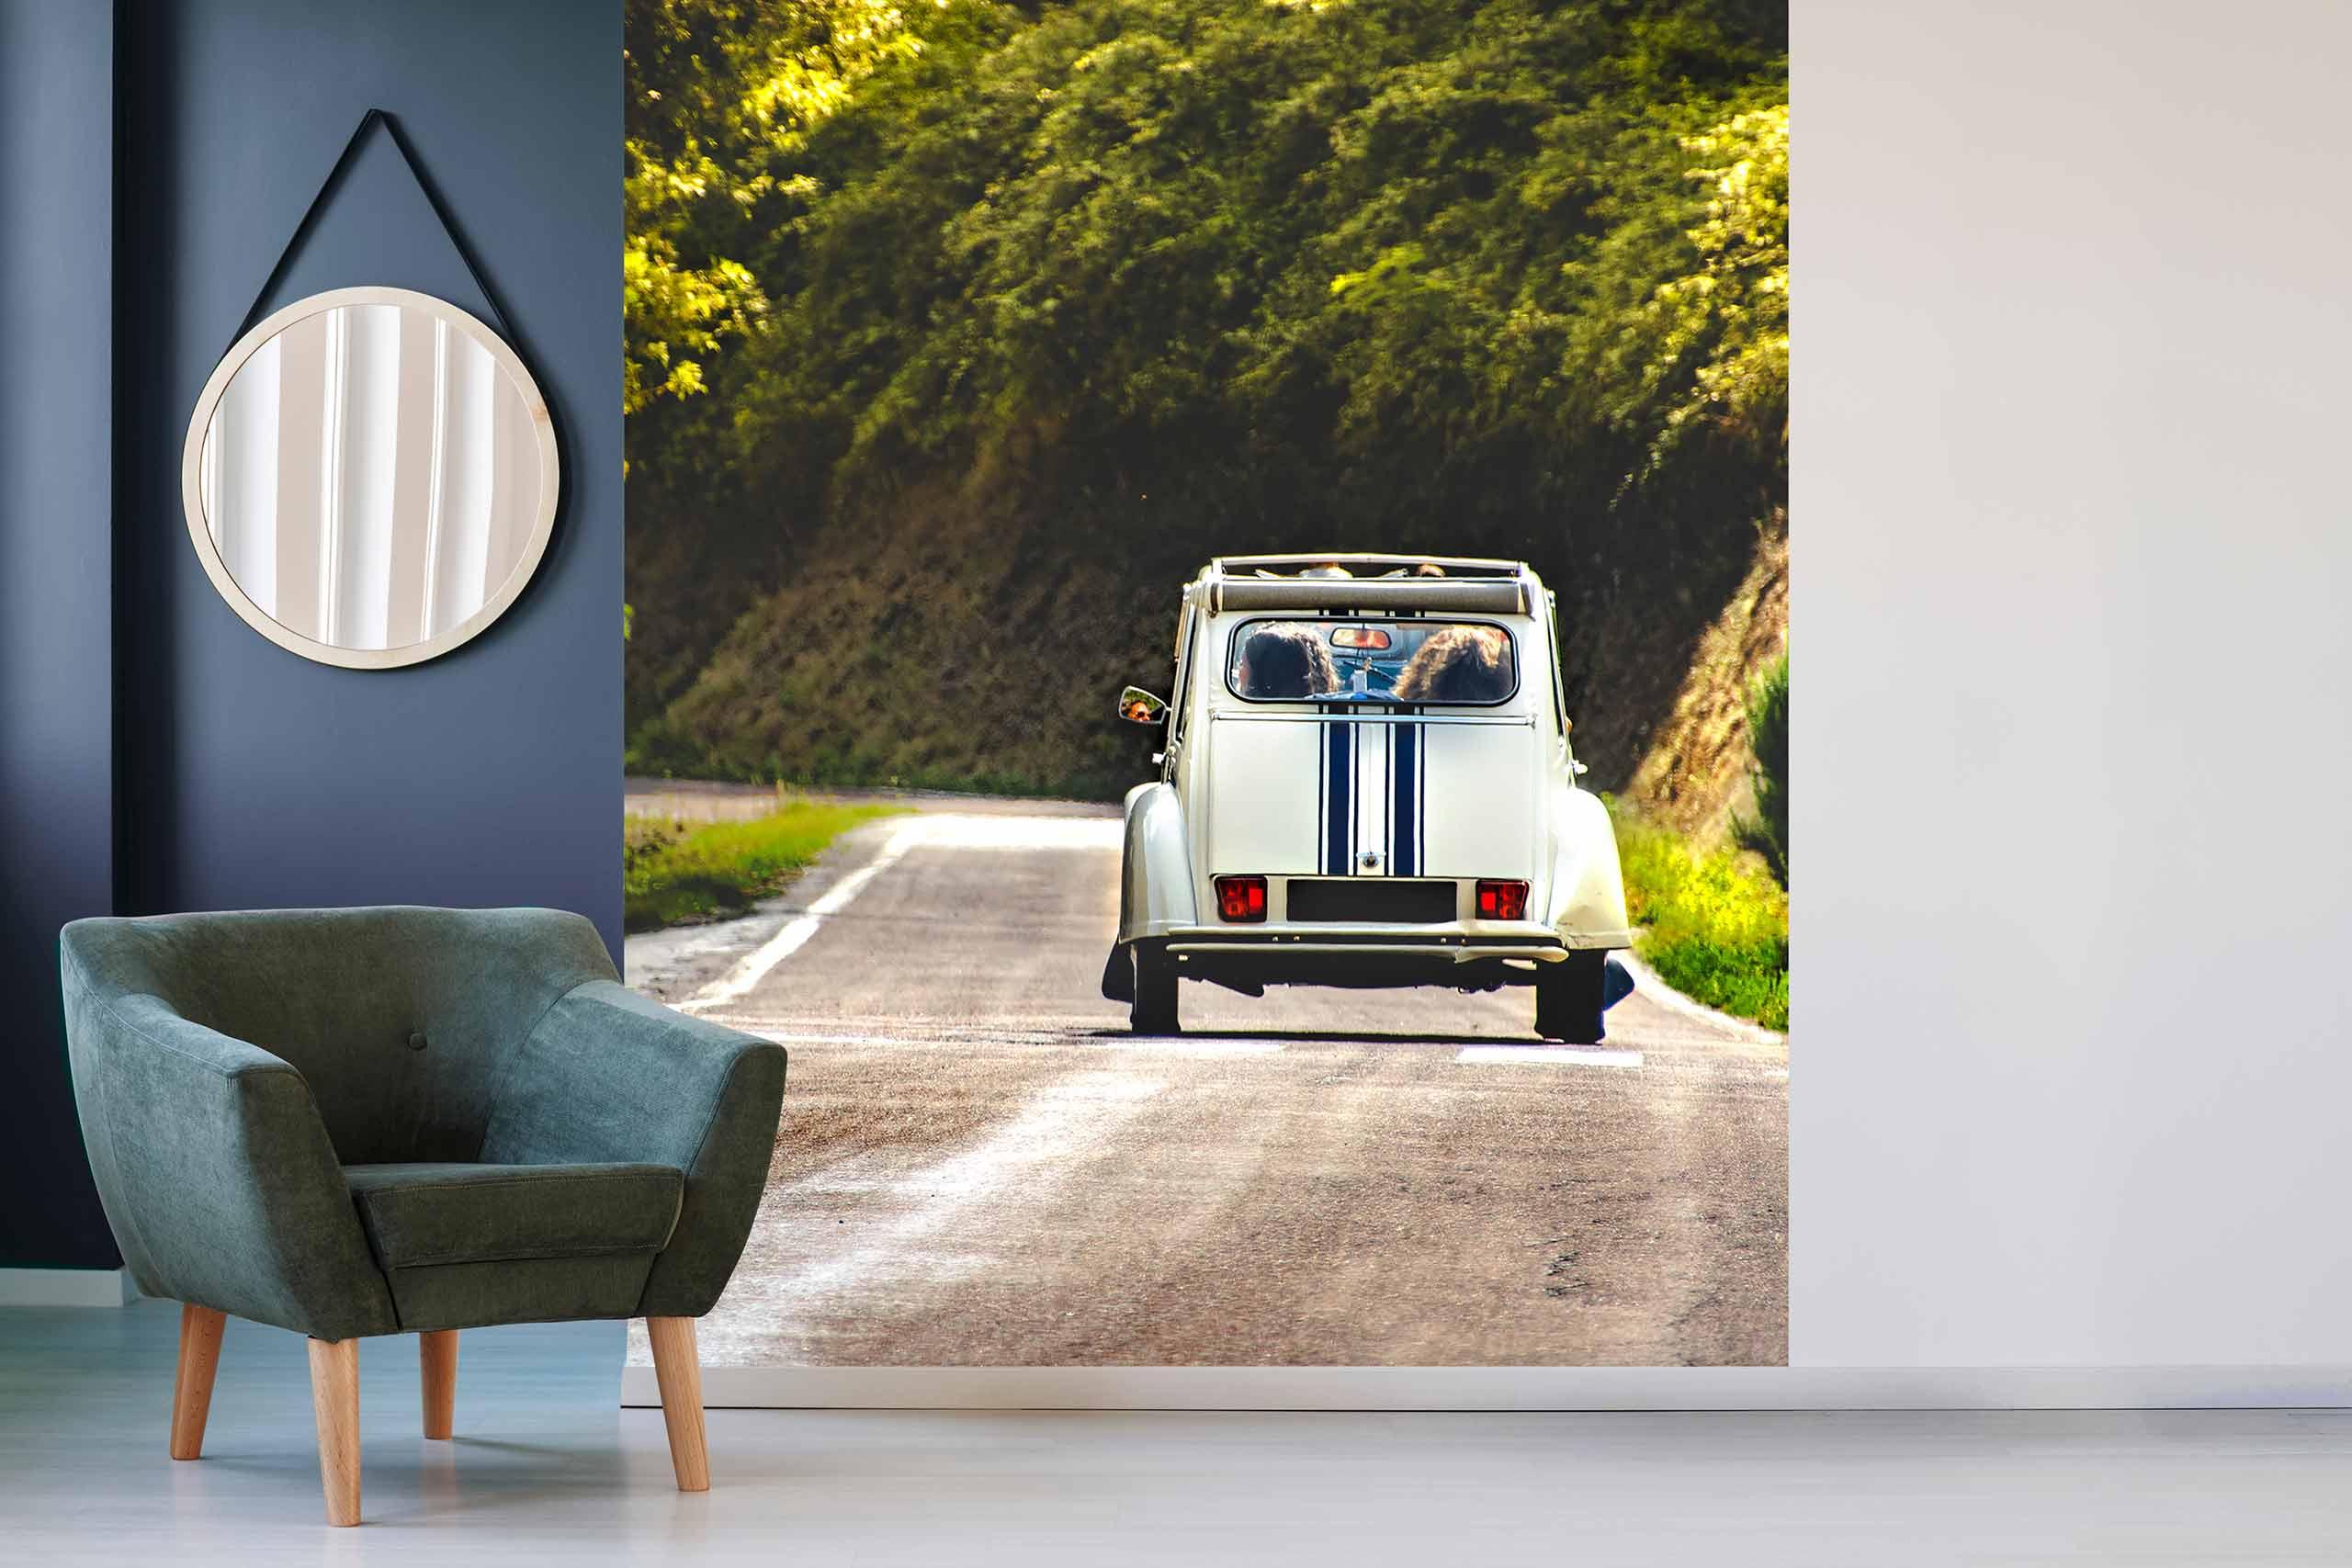 Vlies Tapete 225 Fototapete Höhe 250cm Motiv 160 Vintage Auto